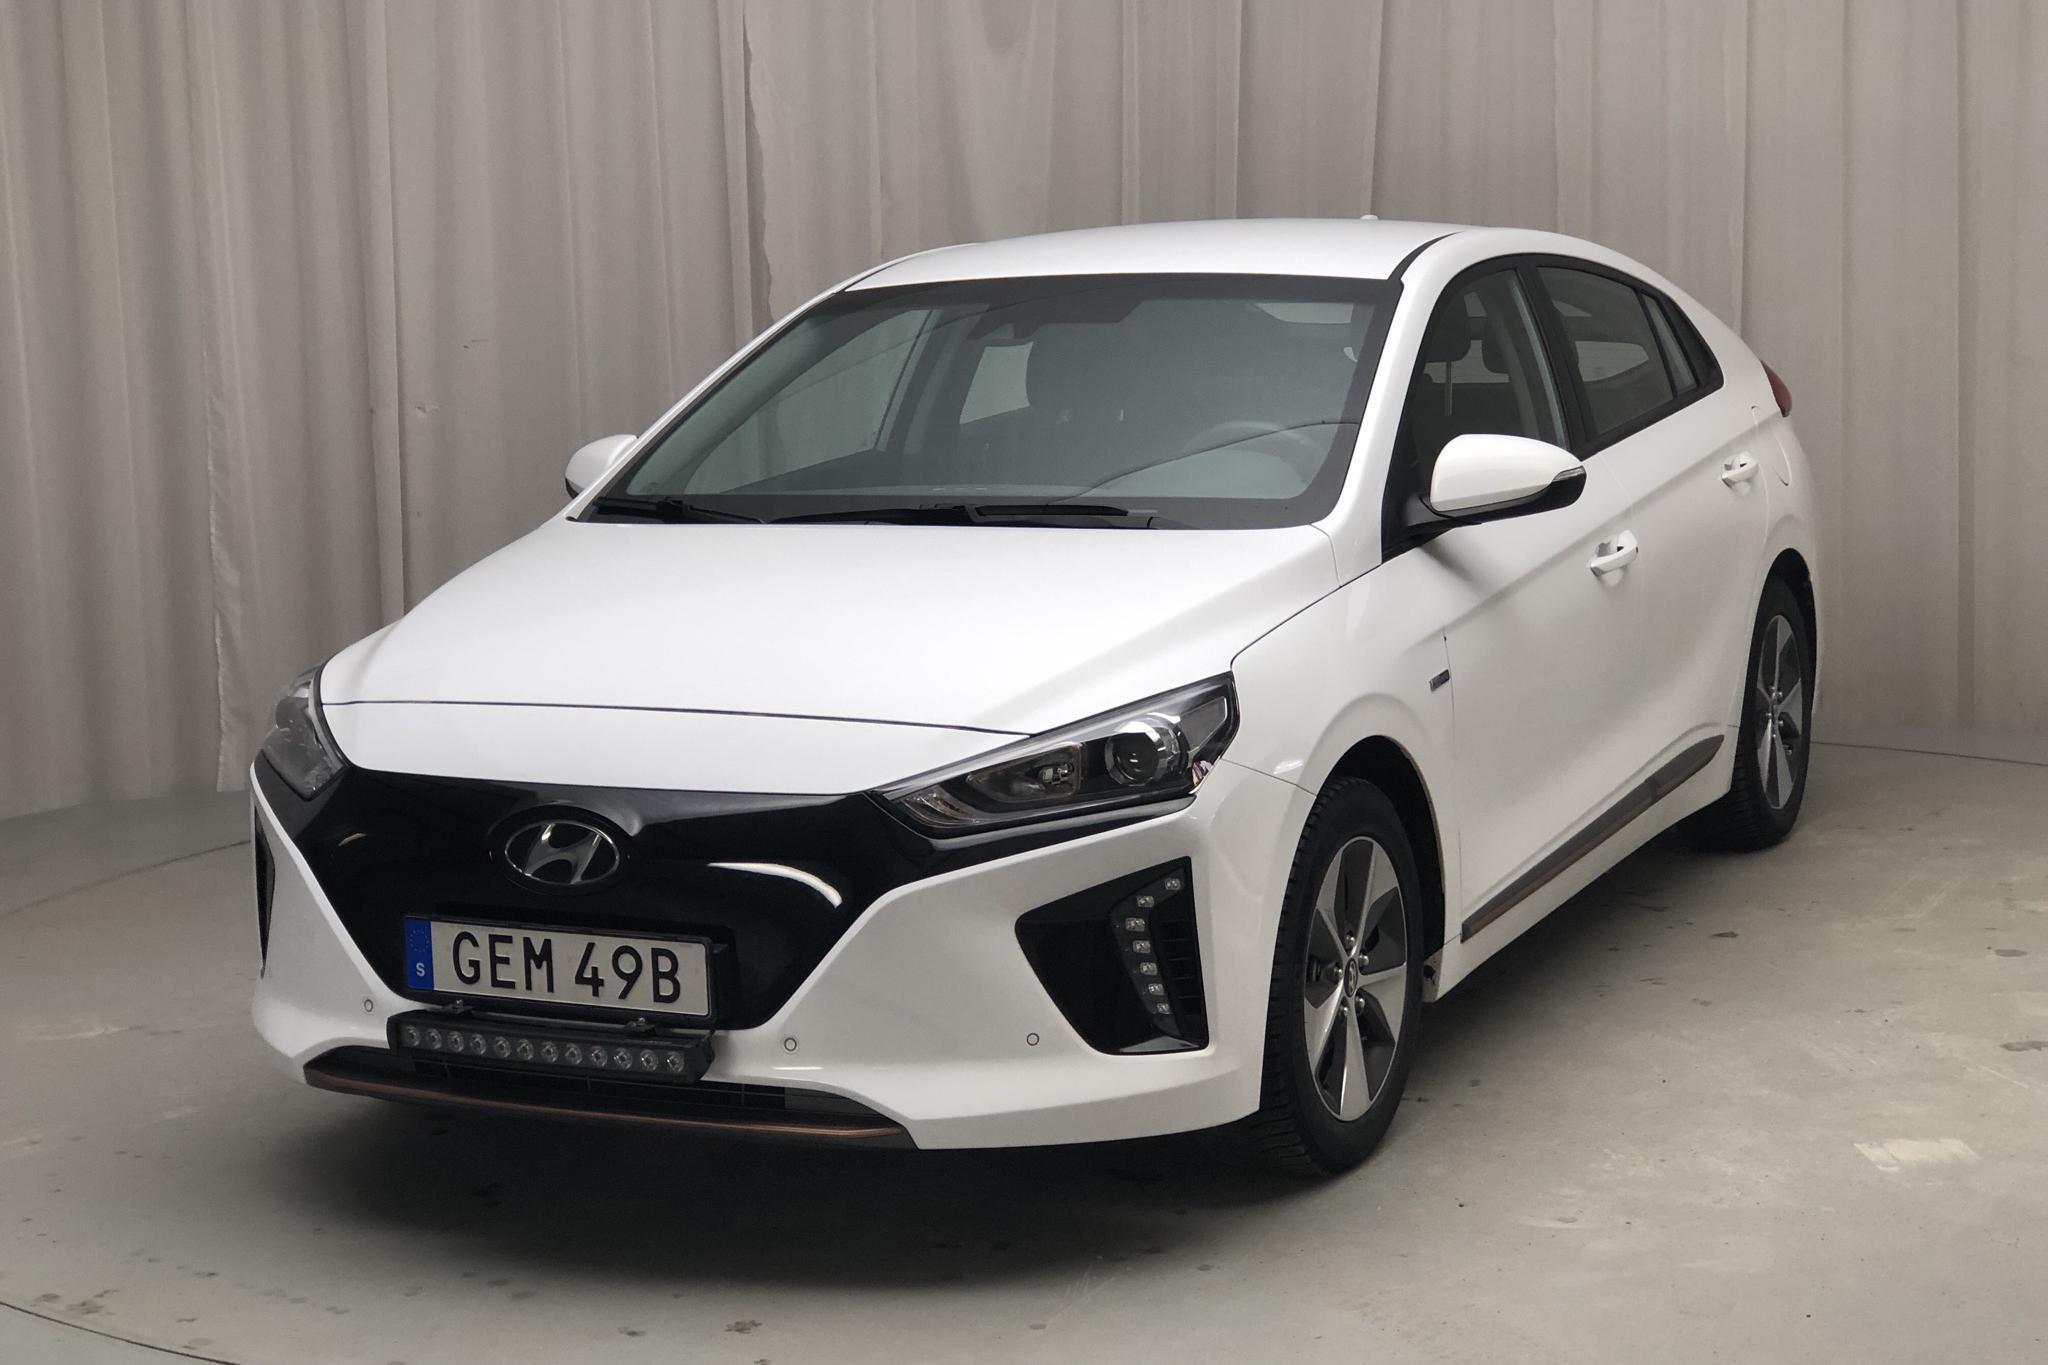 Hyundai IONIQ Electric (120hk) - 39 870 km - Automatic - 2019